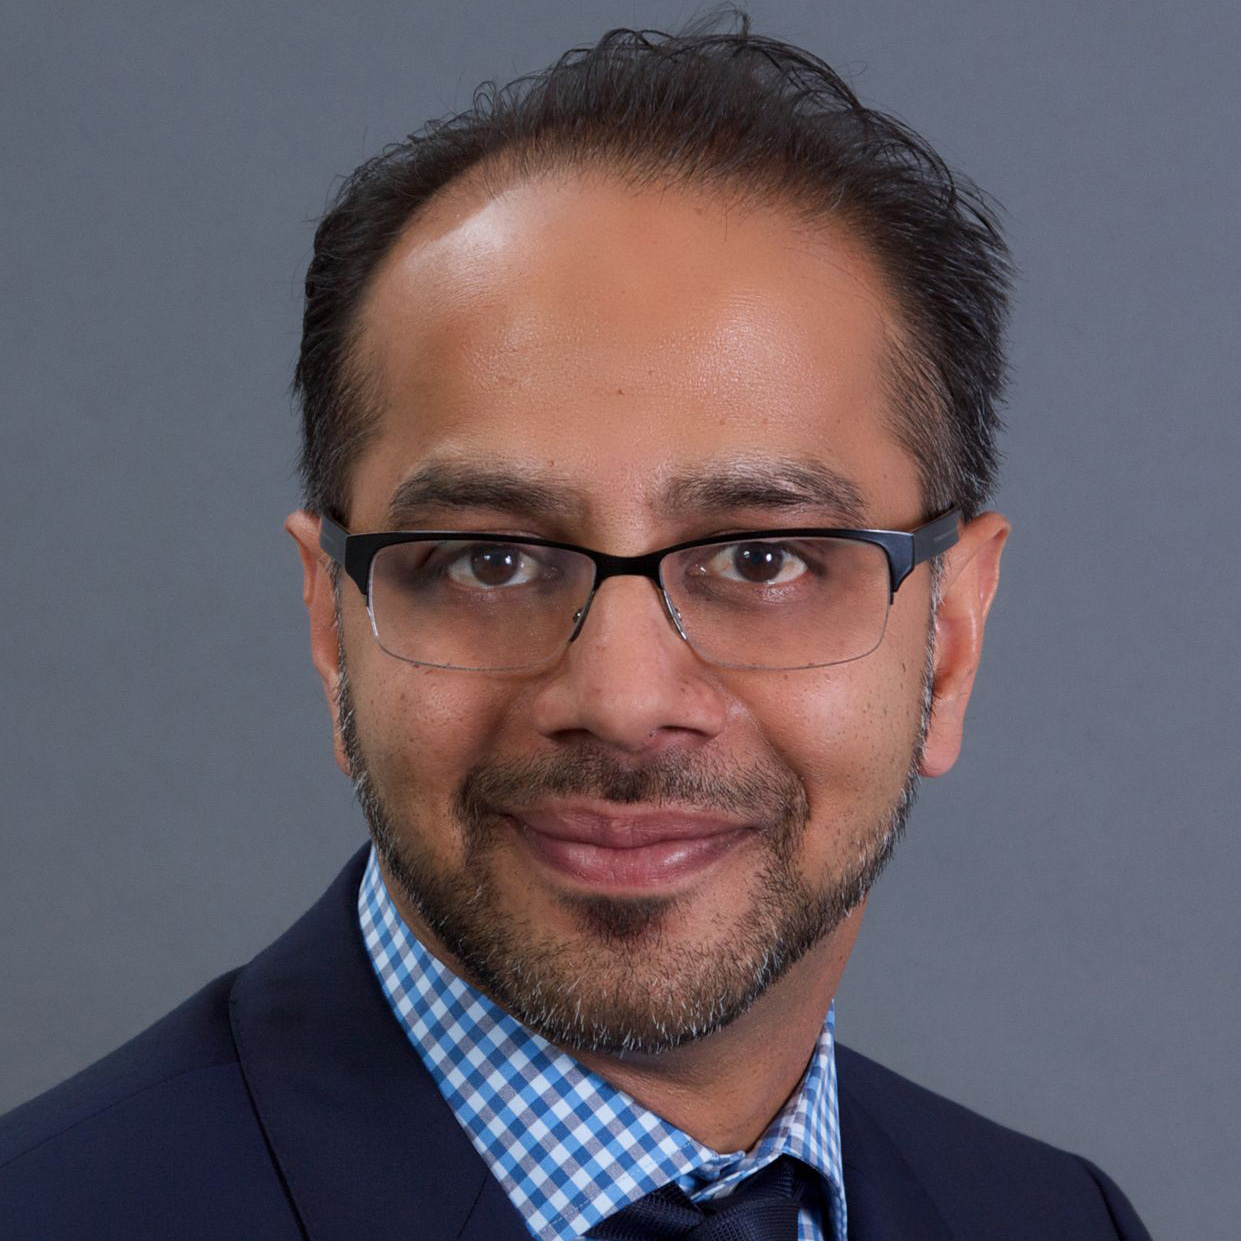 Brij Patel